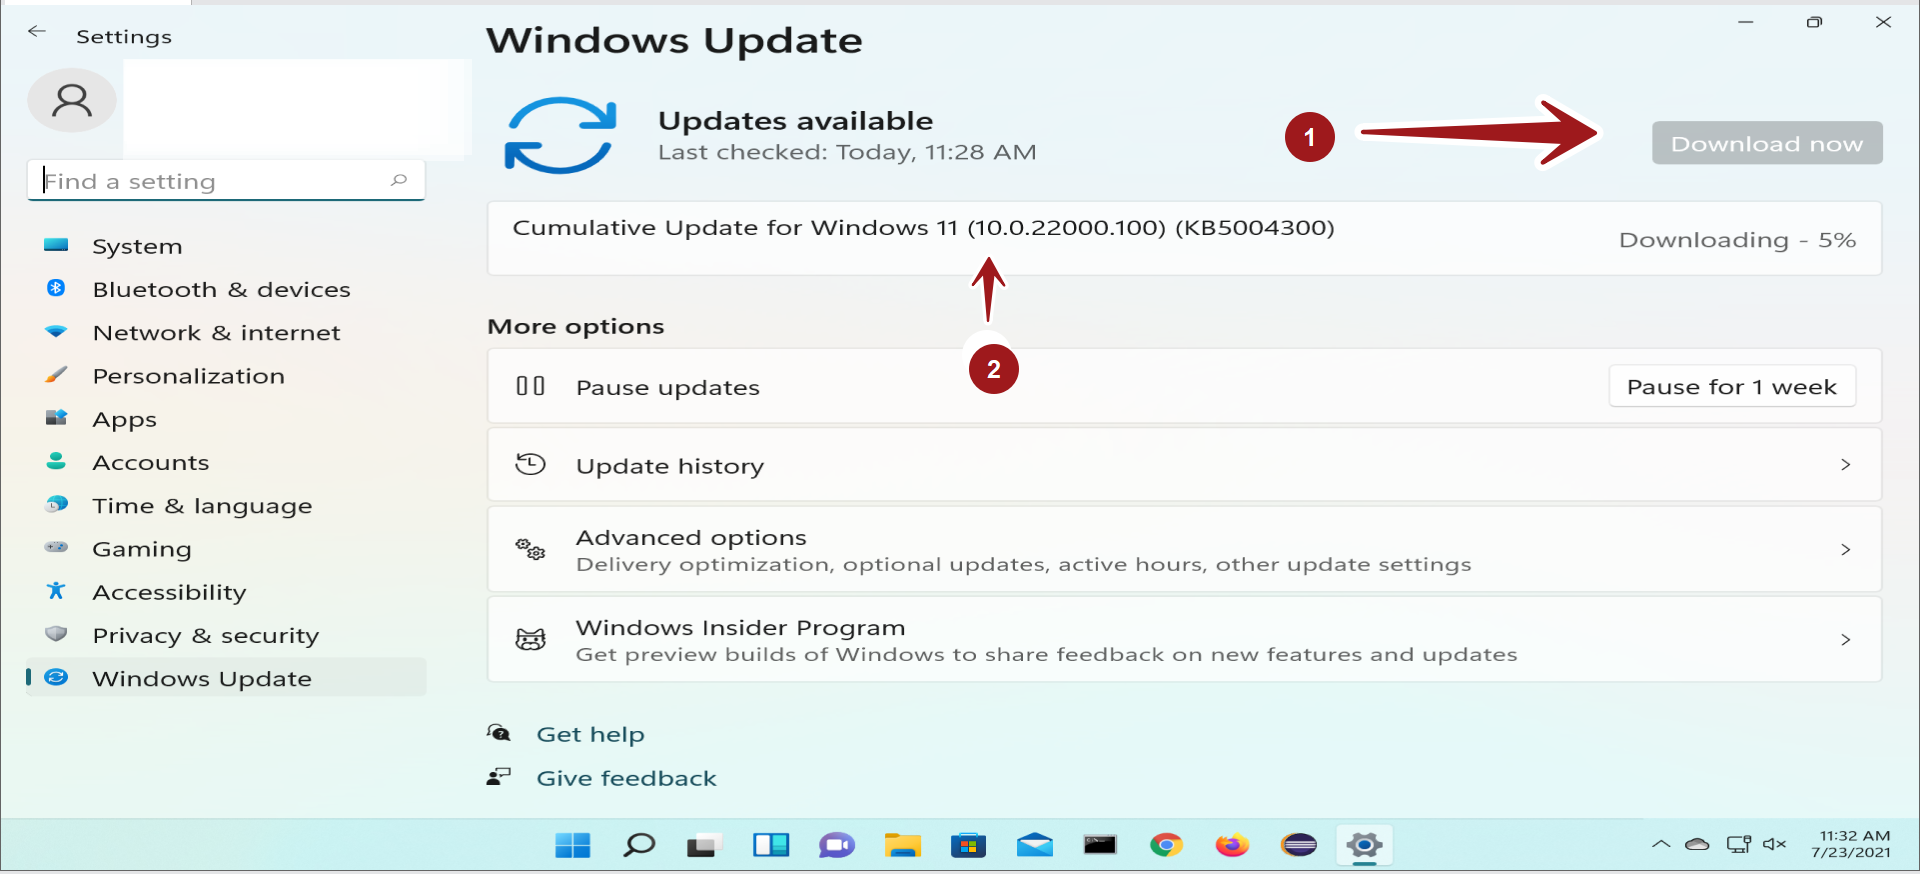 Windows 11 Update Download